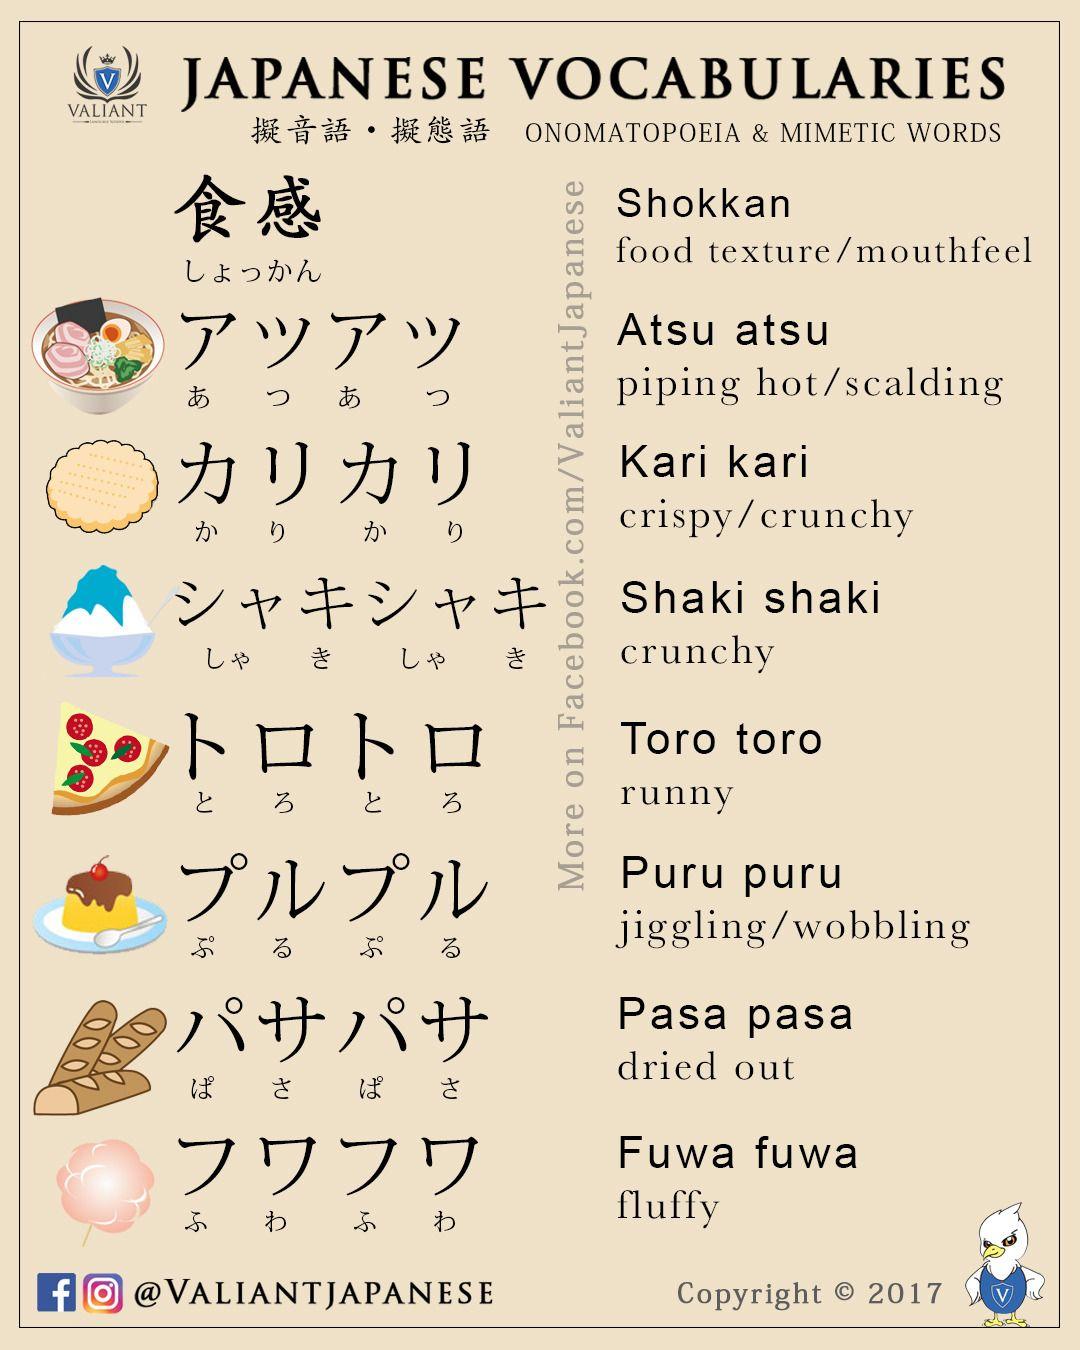 Japanese Vocabulary Flashcards More Flashcards On Stagram Valiantjapanese